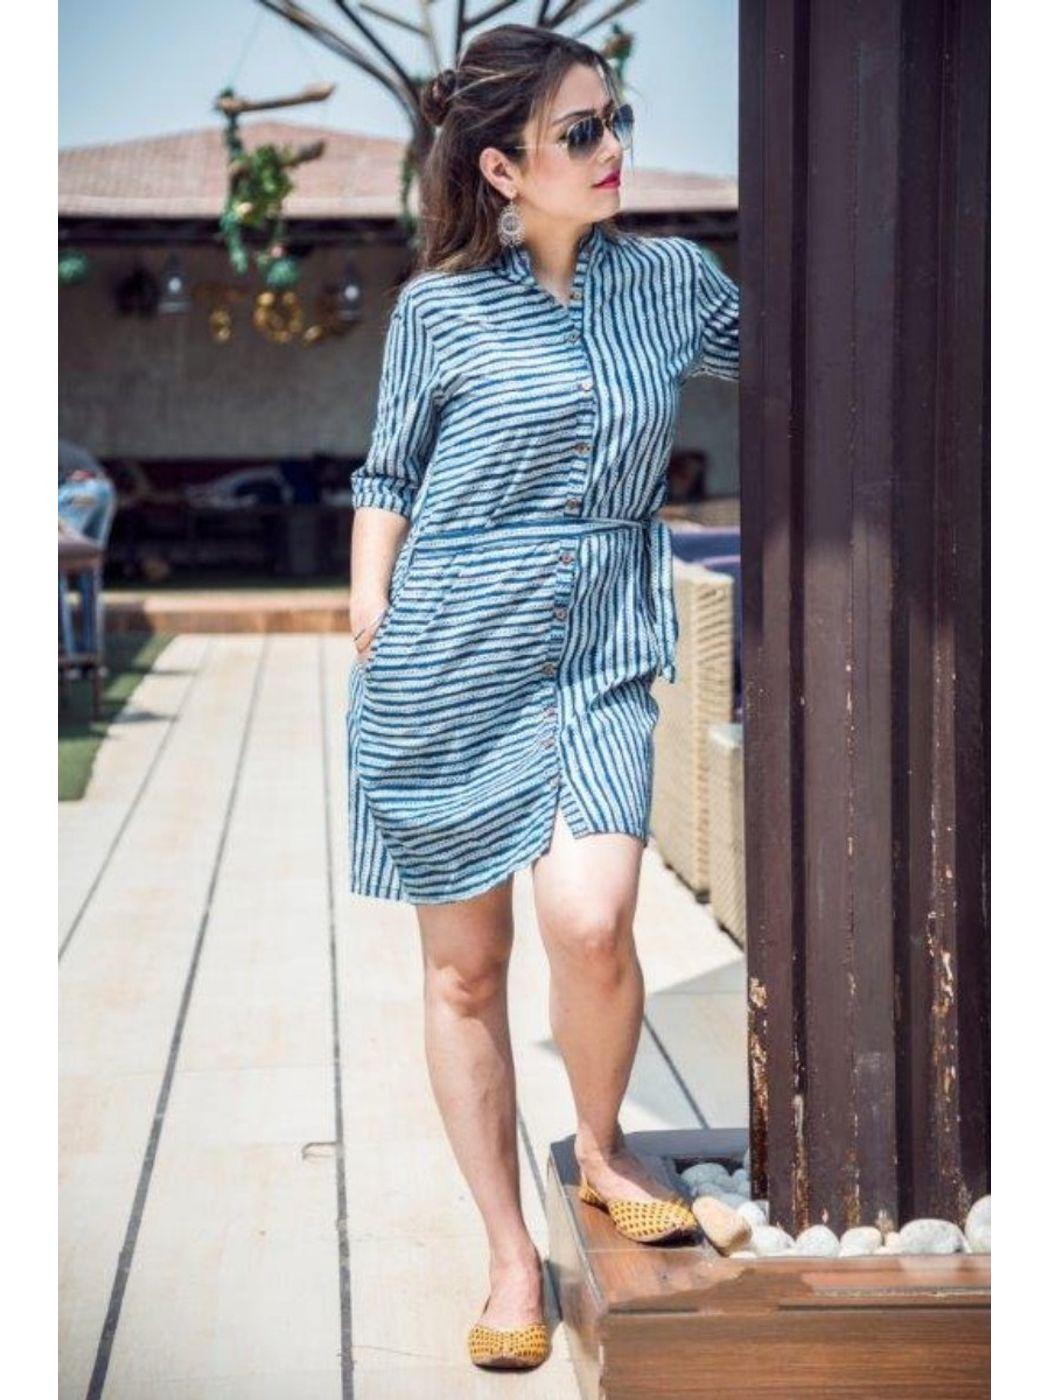 ad69b63e8fb Shirt Dress With Pockets